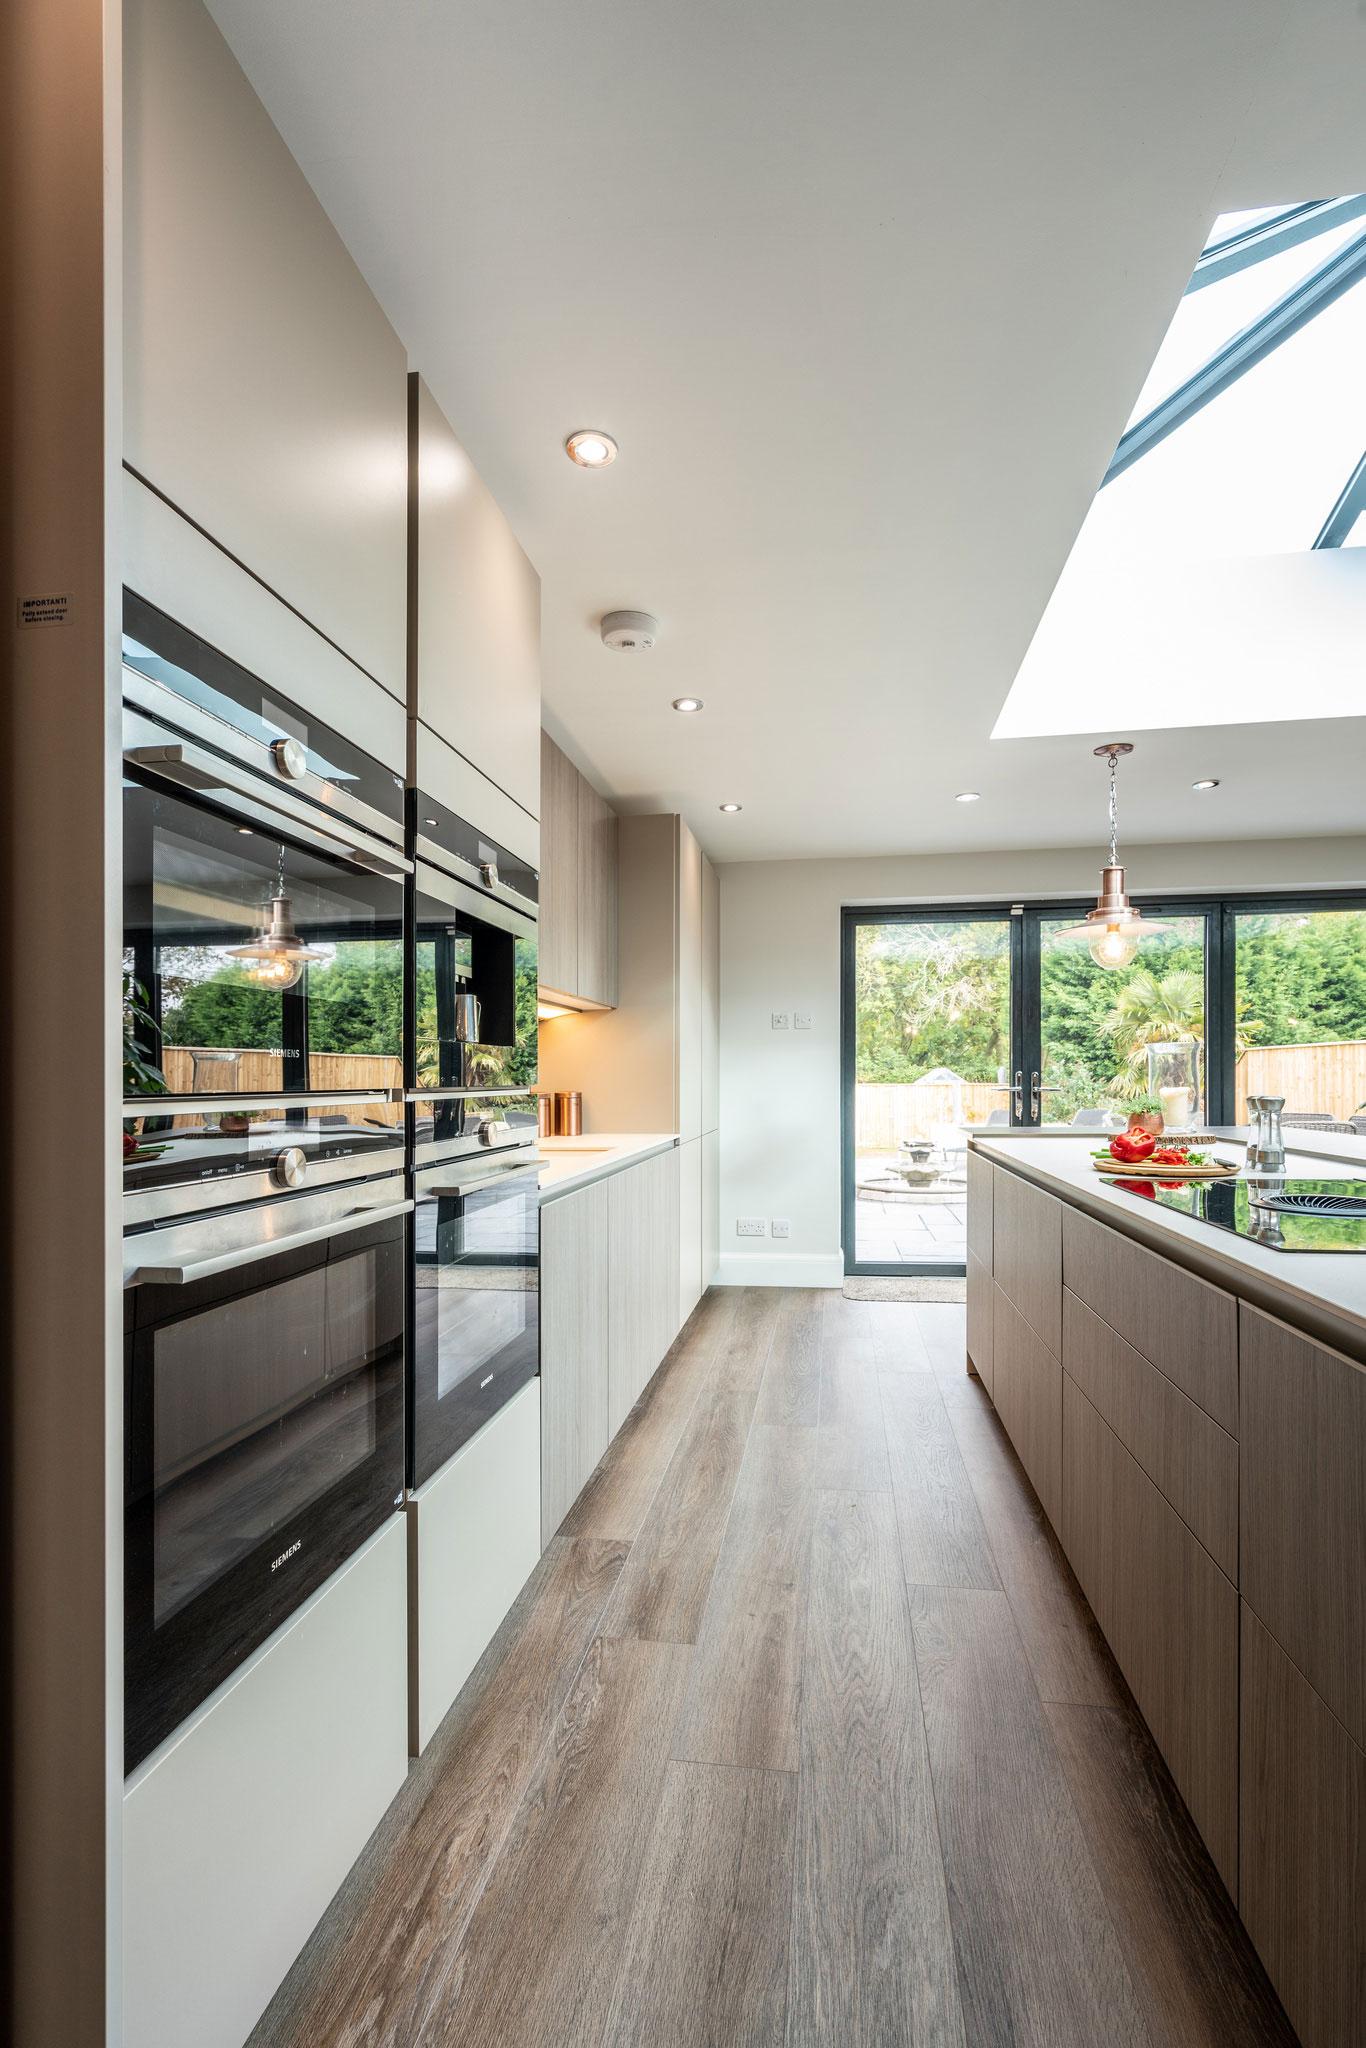 Image of Myers Touch Daniels Kitchen 01102 ZF 2442 14358 1 043 in Een ruimte ontworpen om te socializen - Cosentino